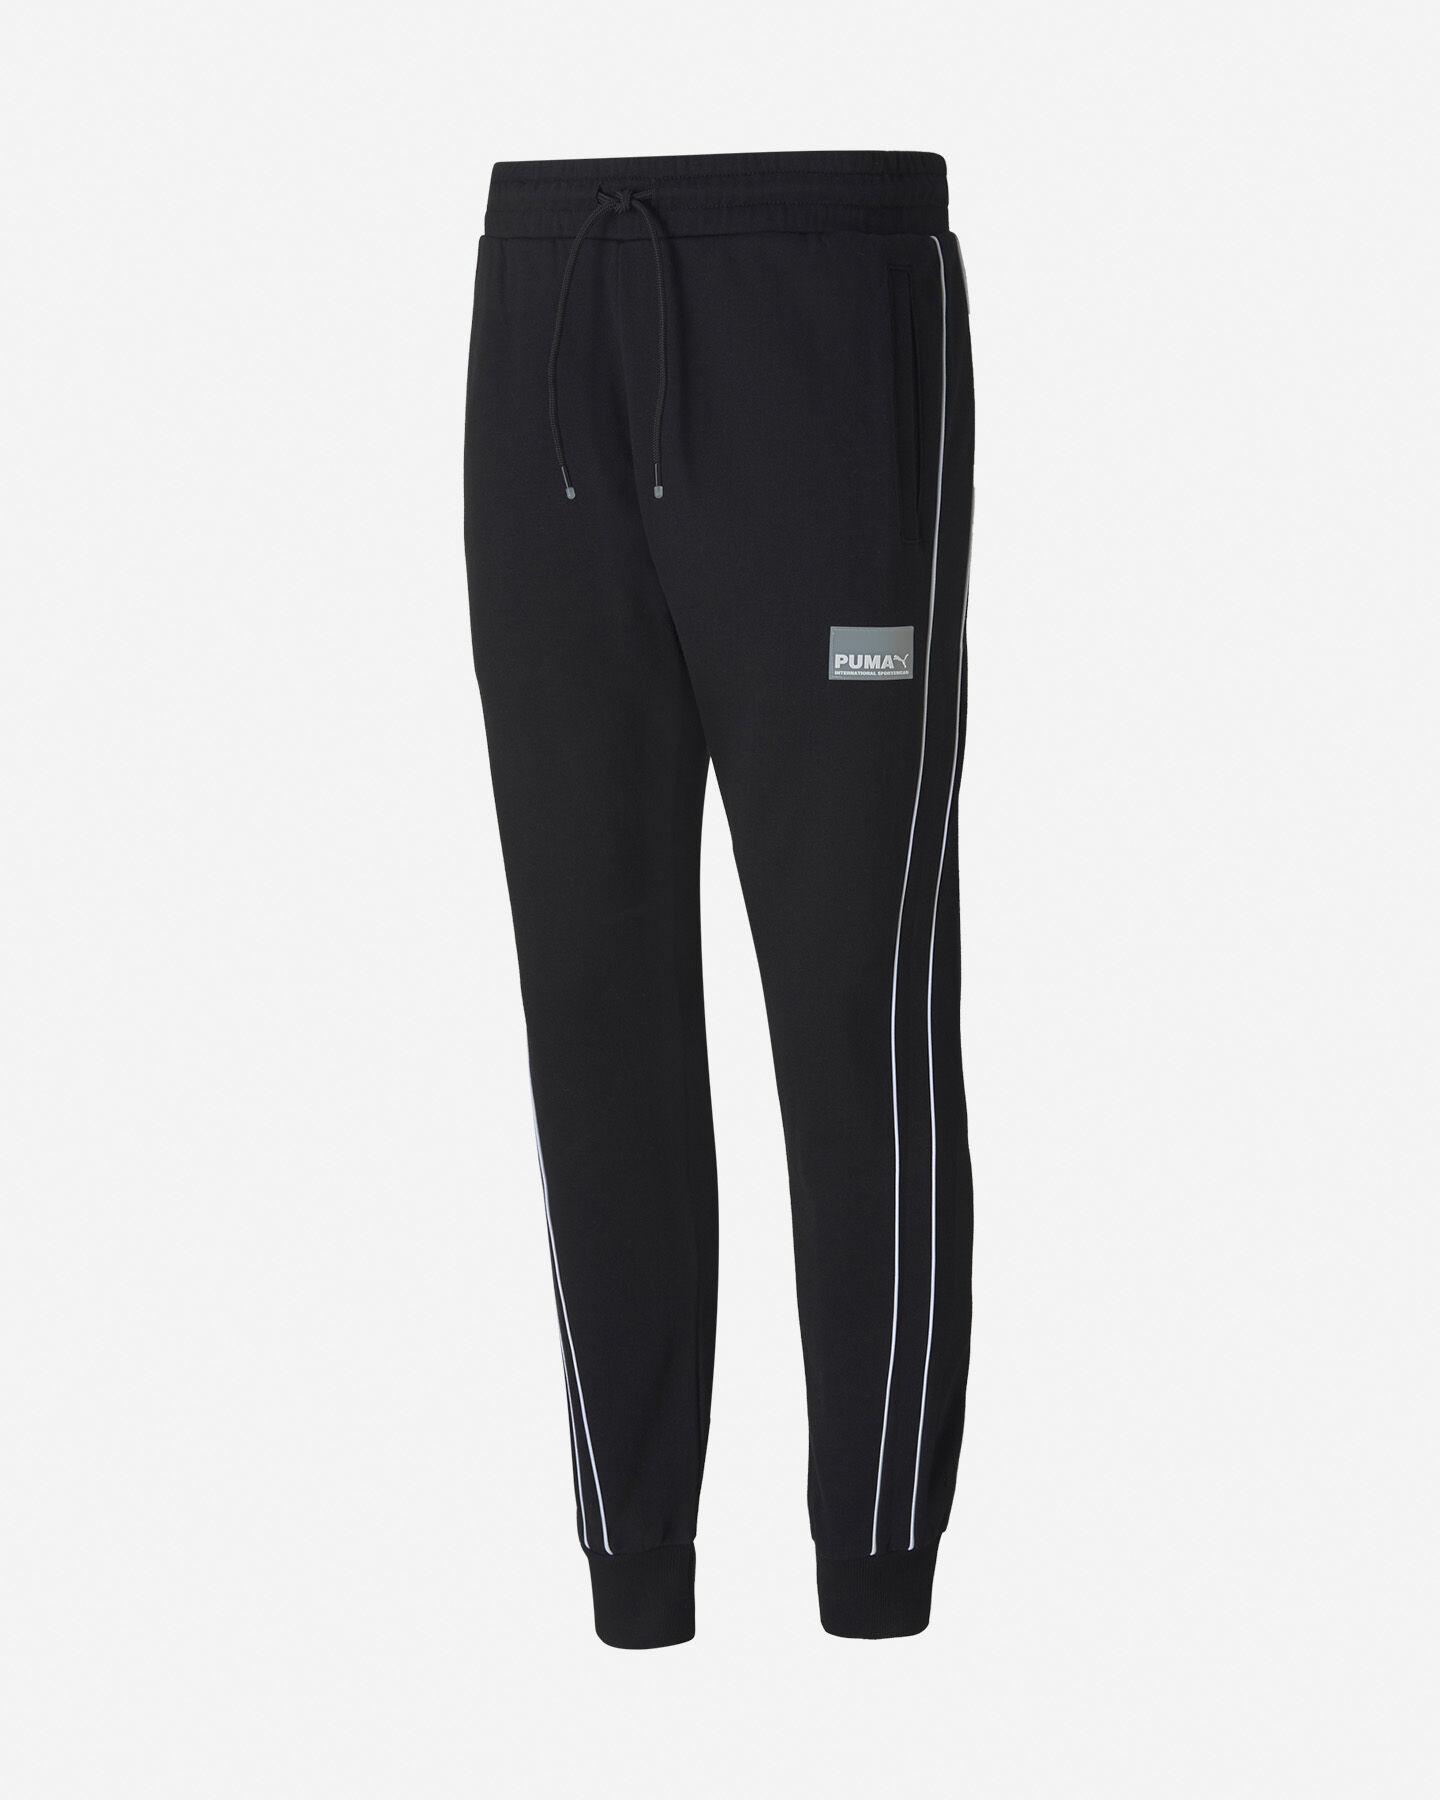 Pantalone PUMA AVENIR FNG M S5235574 scatto 0